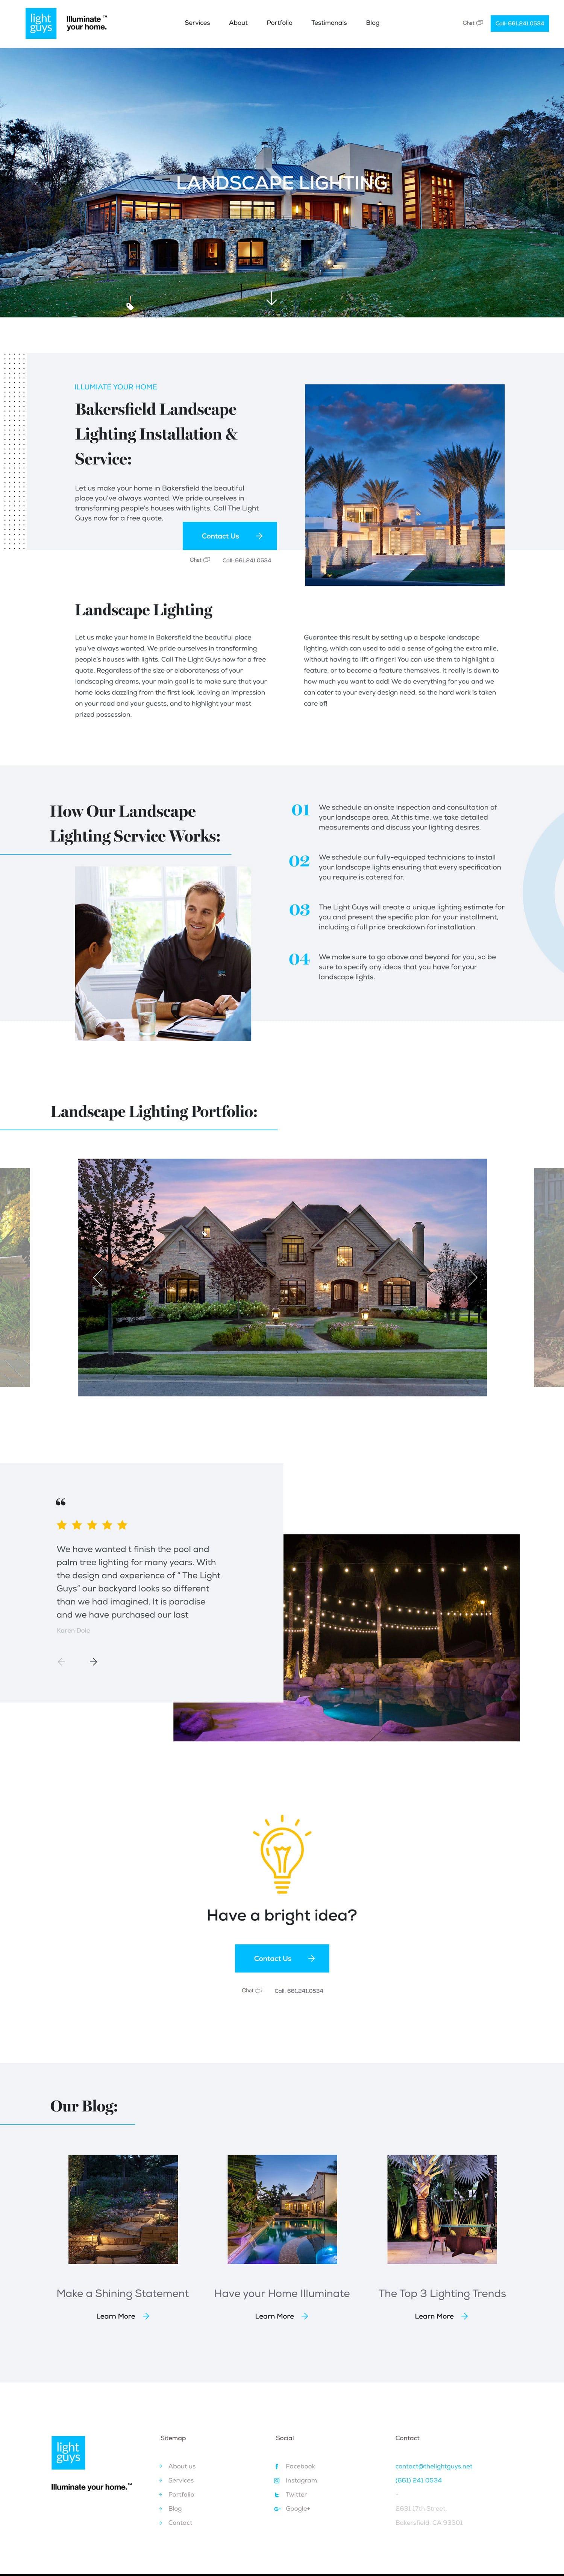 Web Design | Light Guys - Landscape Lighting (Desktop View)